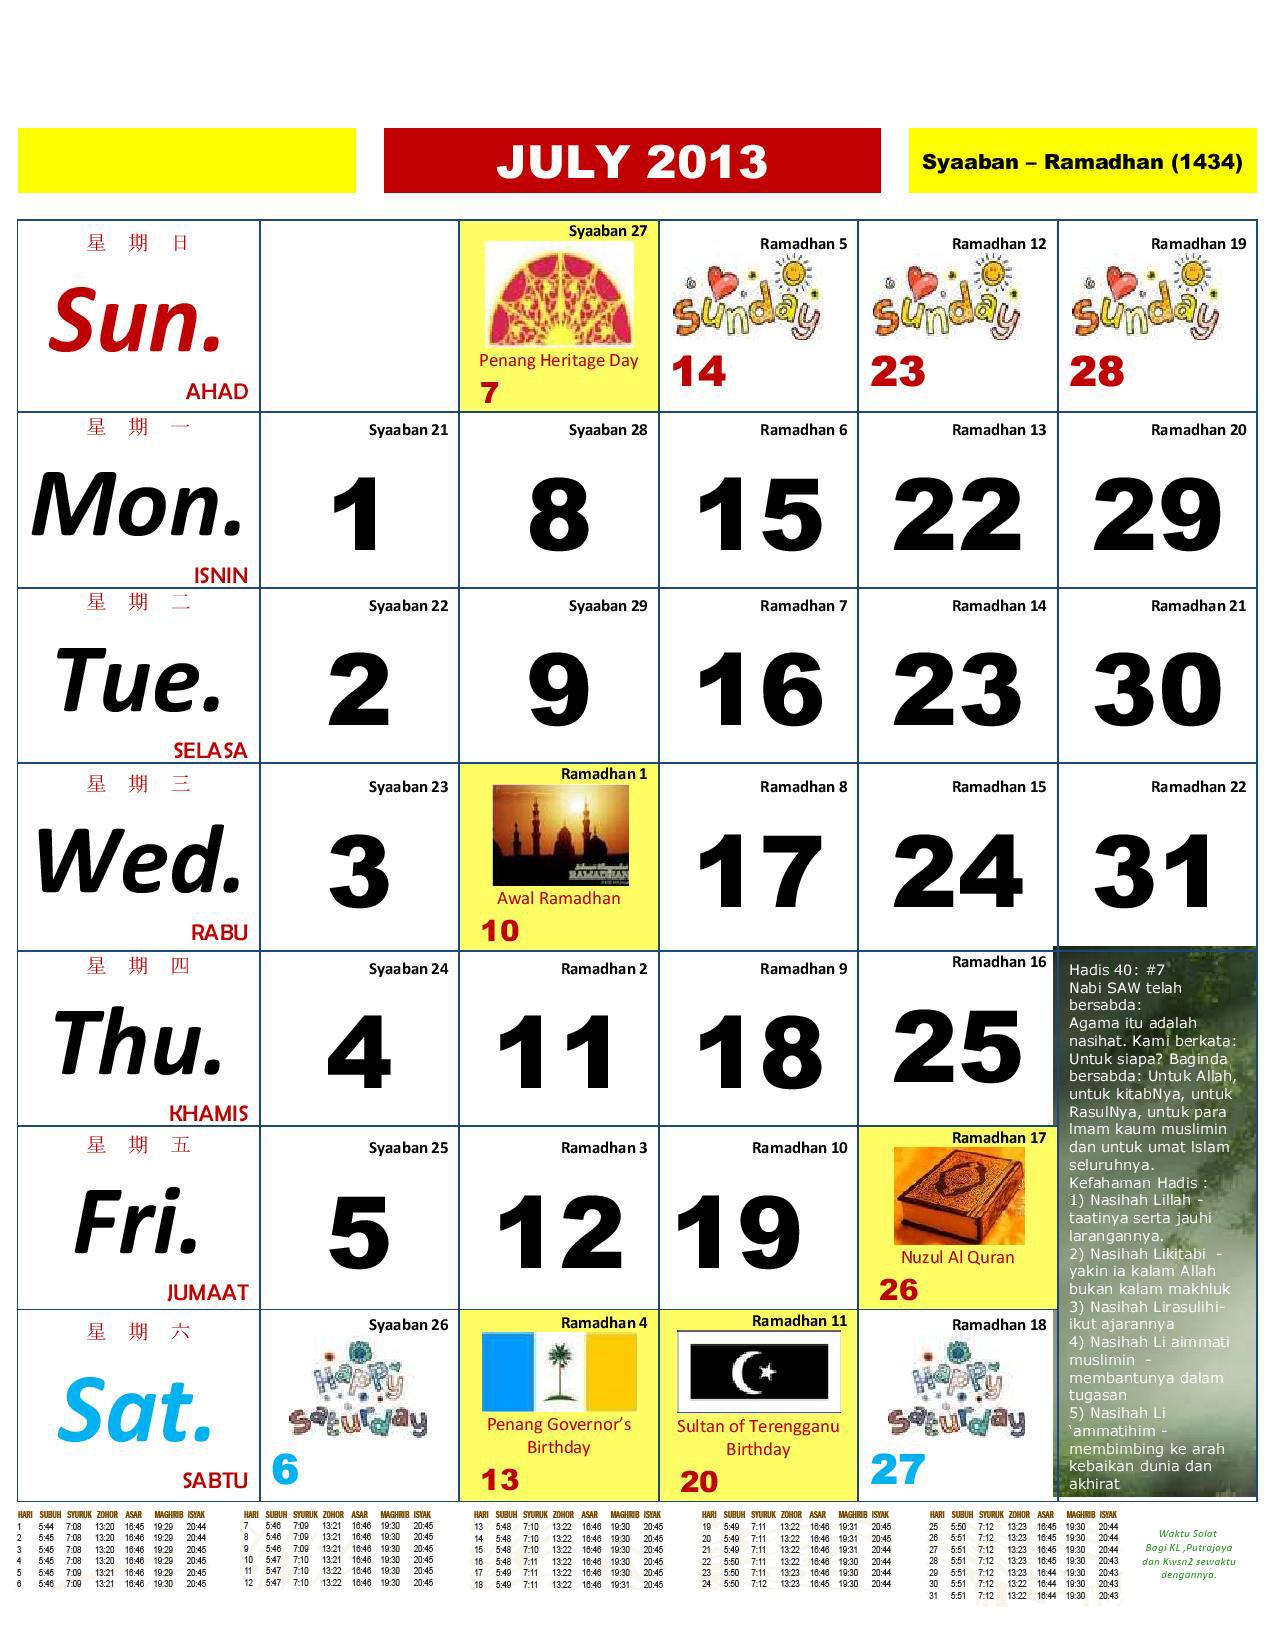 Kalender Hijriyah Wikipedia Bahasa Indonesia Apexwallpapers Com